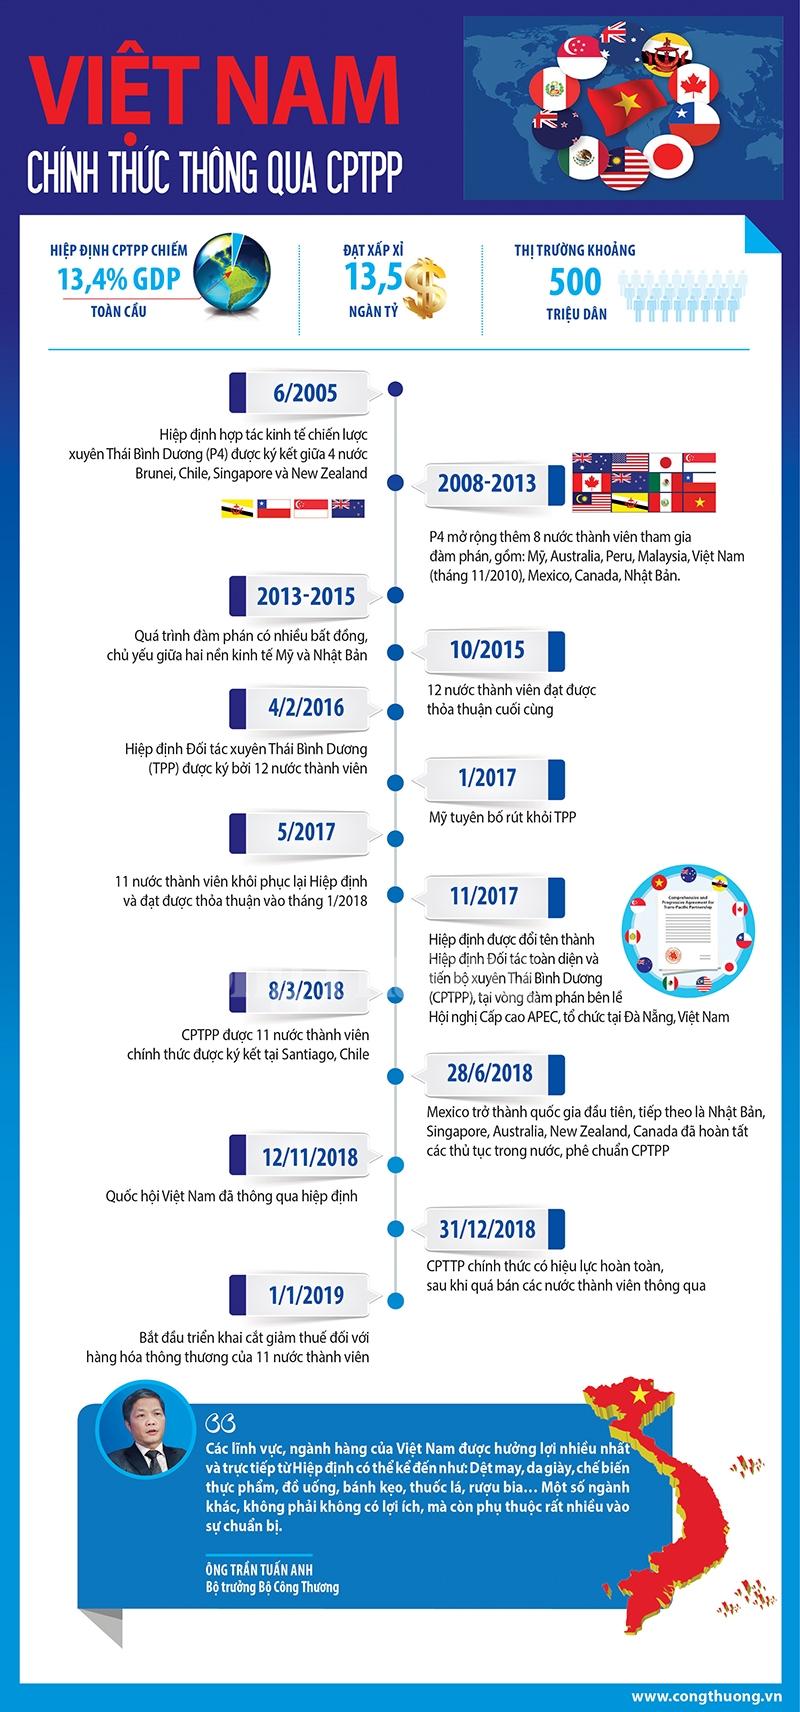 infographic viet nam tro thanh quoc gia thu 7 thong qua cptpp